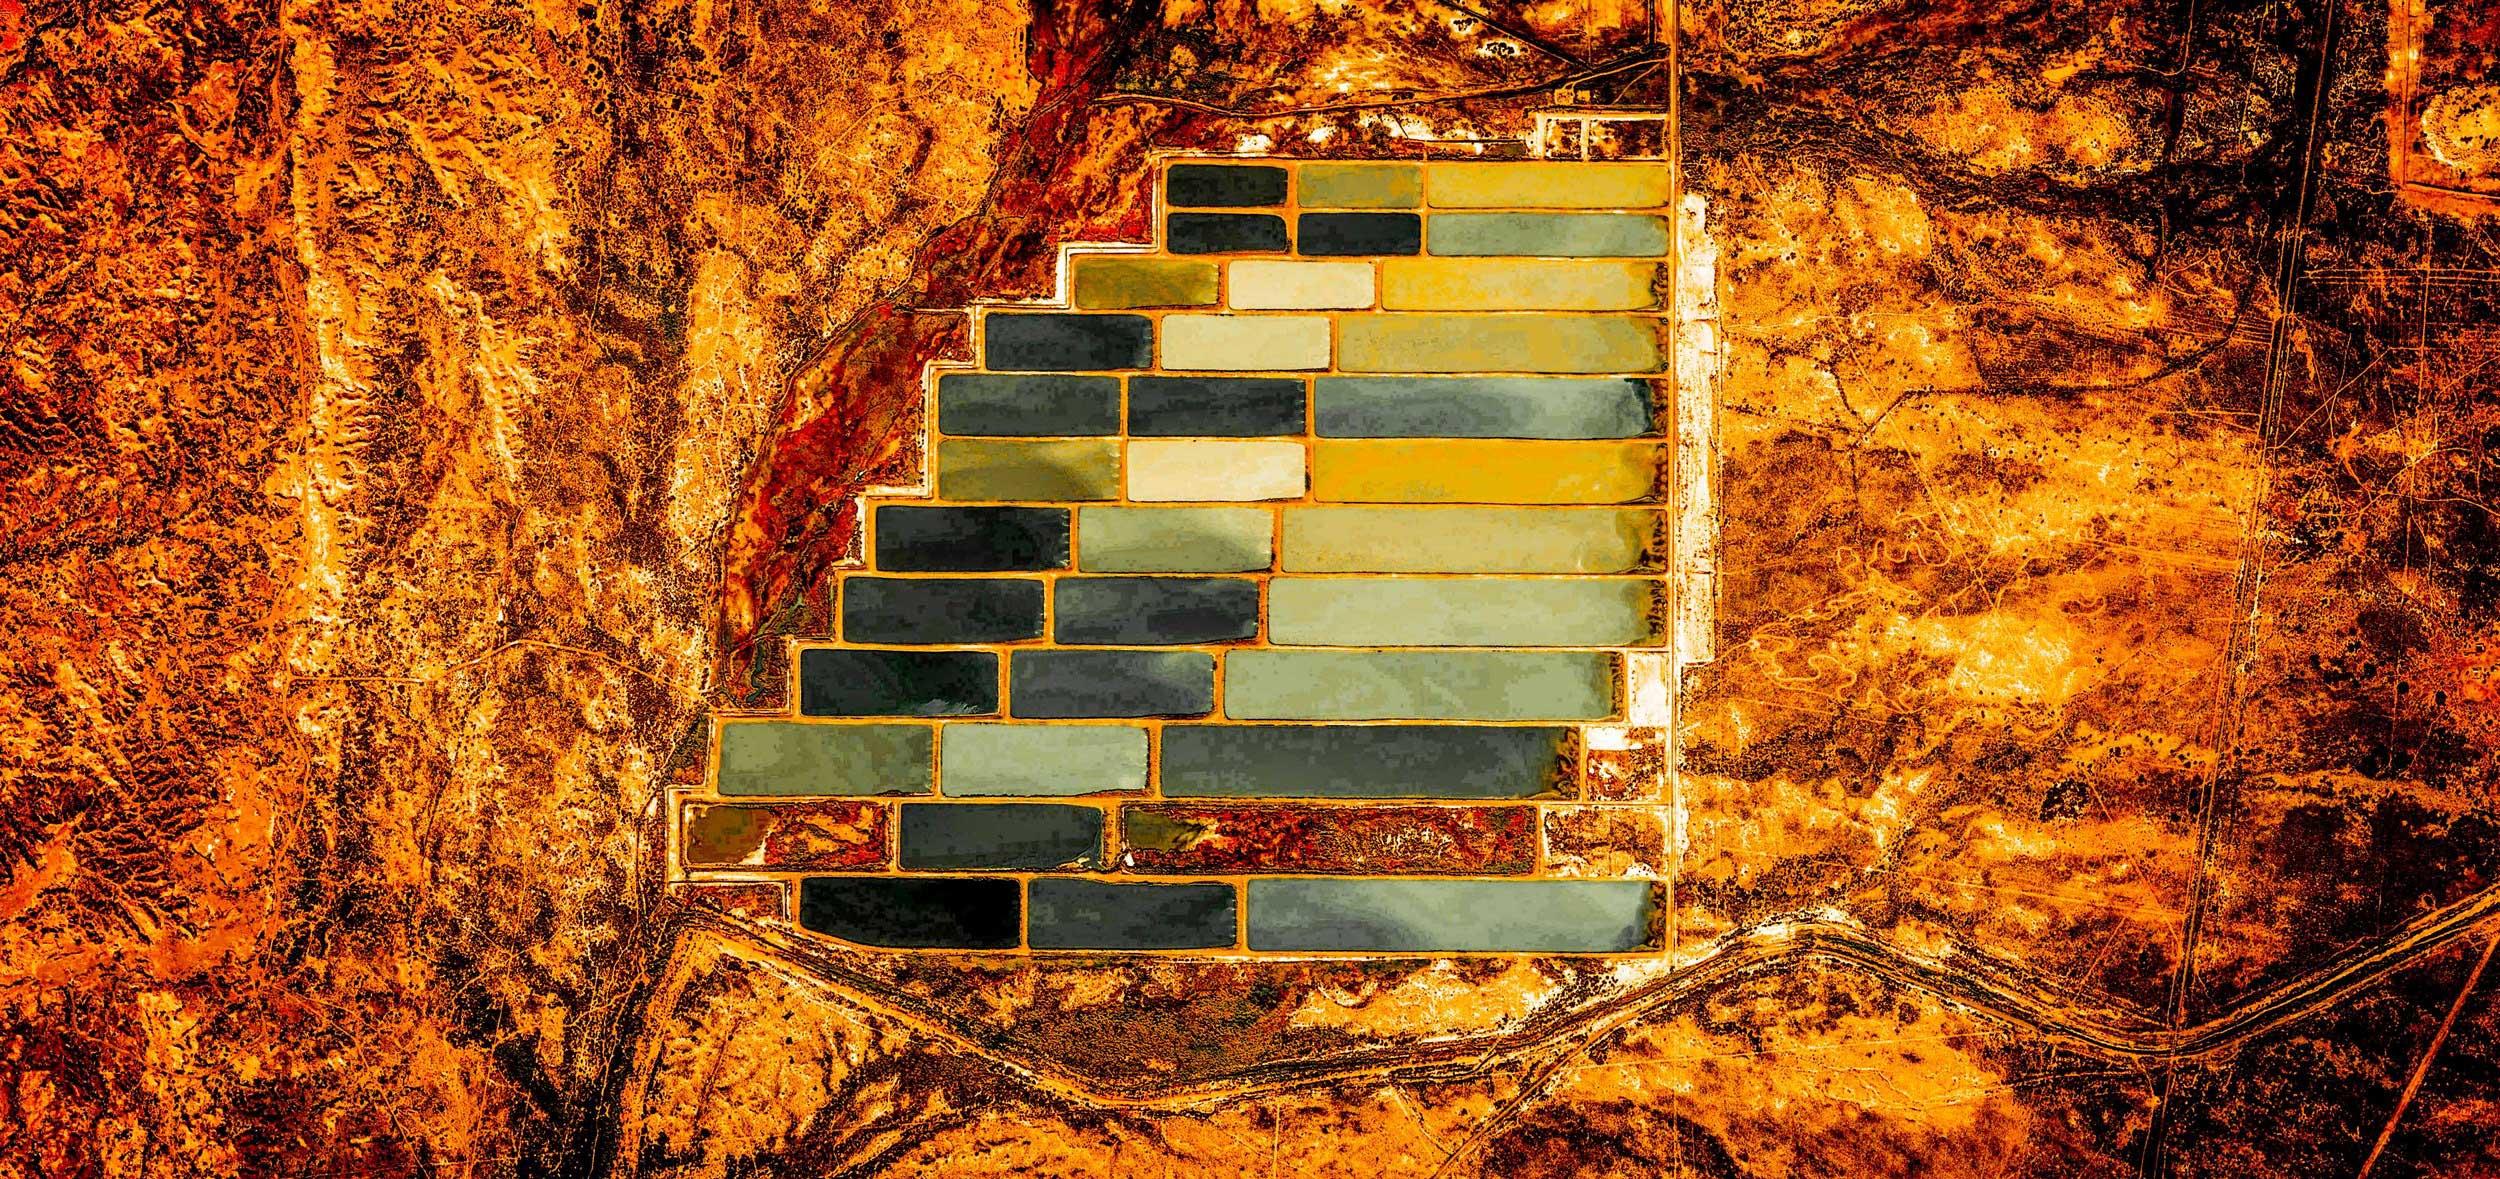 MENDOZA-ULTRADISTANCIA-©Federico-WIner.jpg